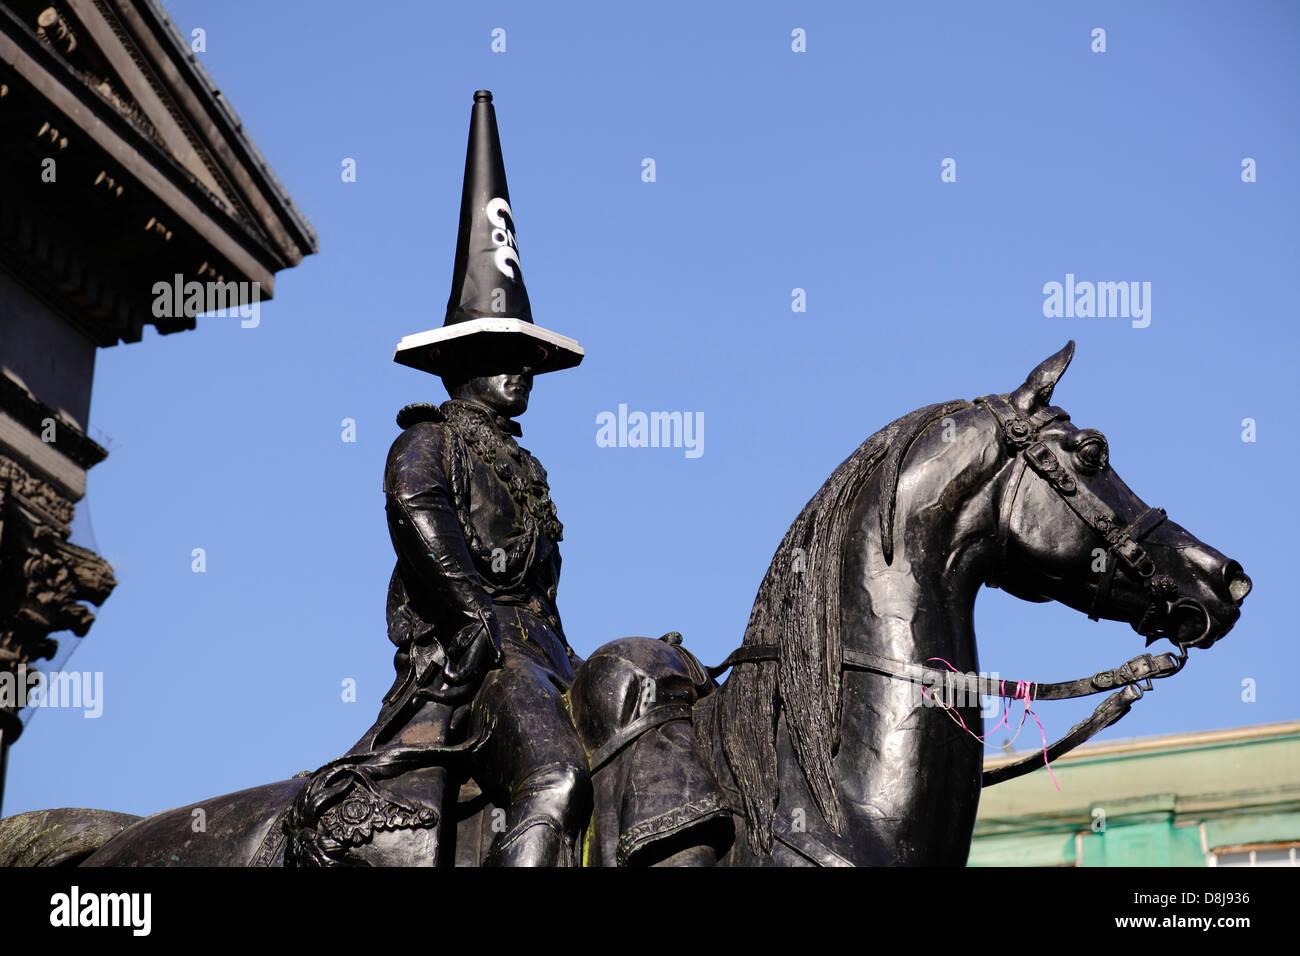 The Duke of Wellington statue with a cone, Glasgow, Scotland, UK - Stock Image